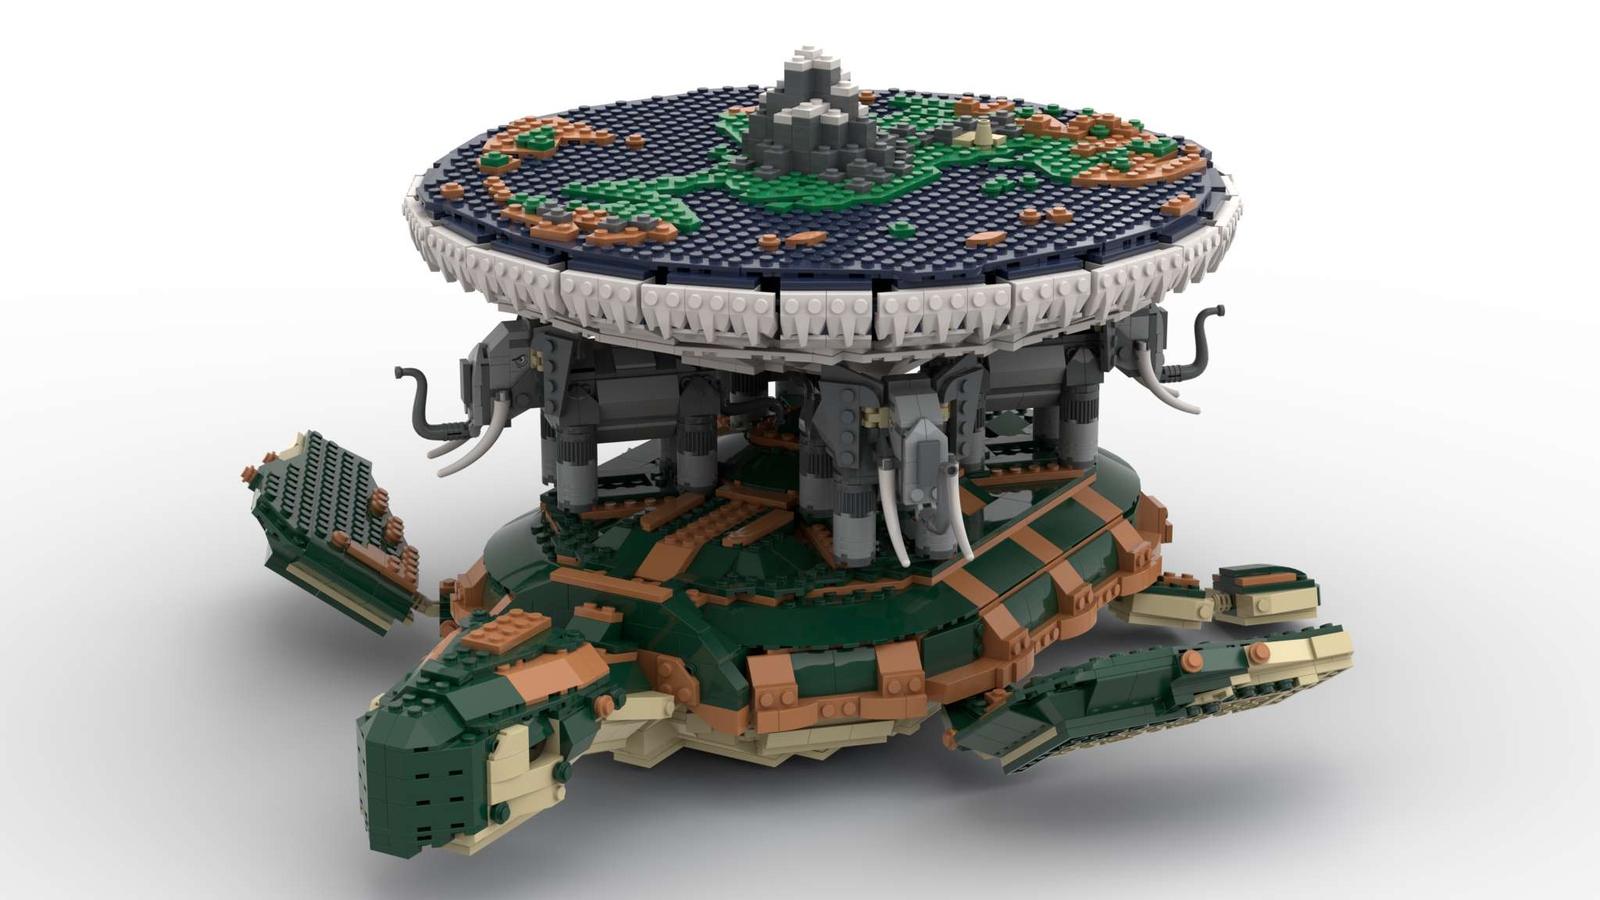 lego-ideas-terry-pratchetts-discworld-brickhammer-2 zusammengebaut.com